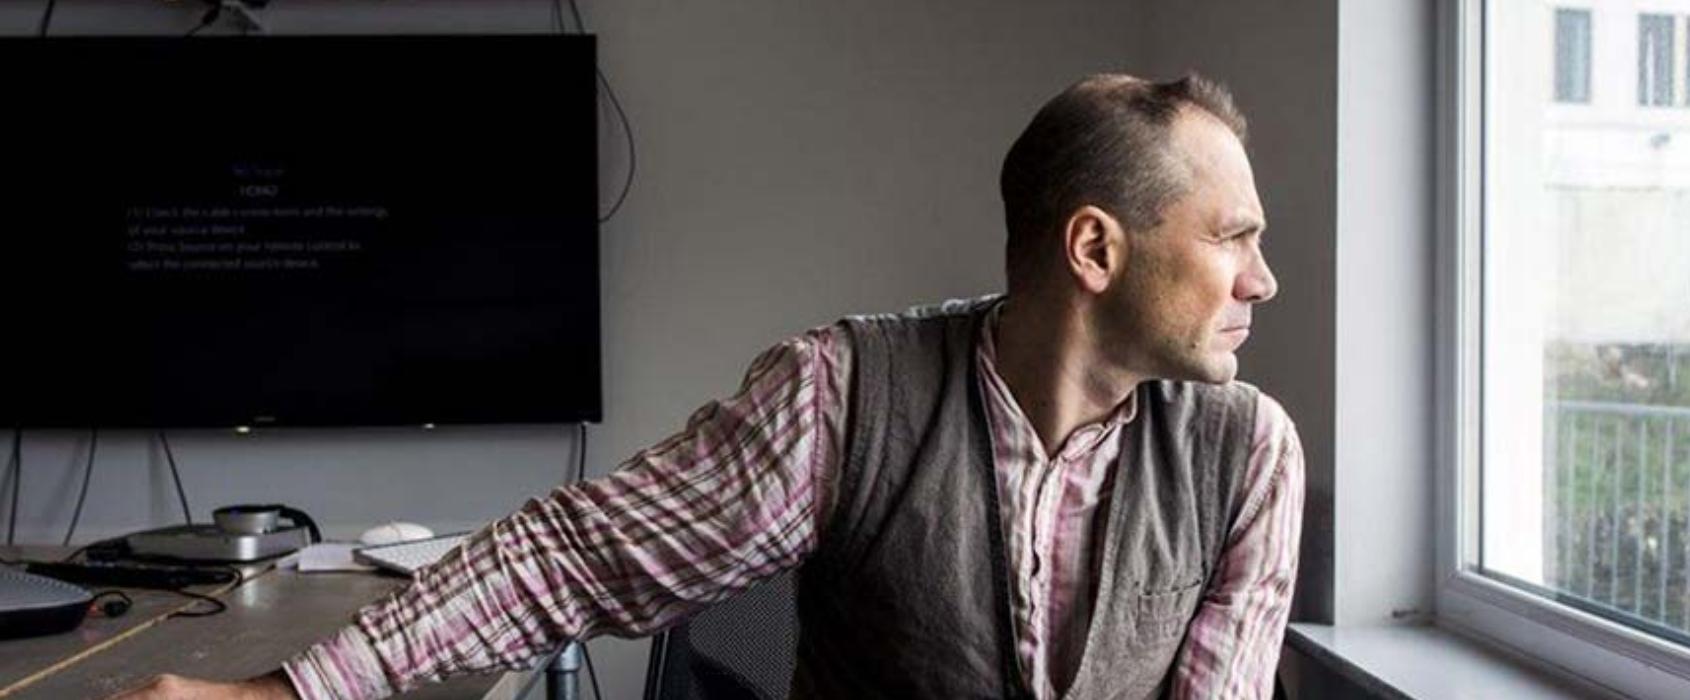 Crowdfunder CEO Rob Love